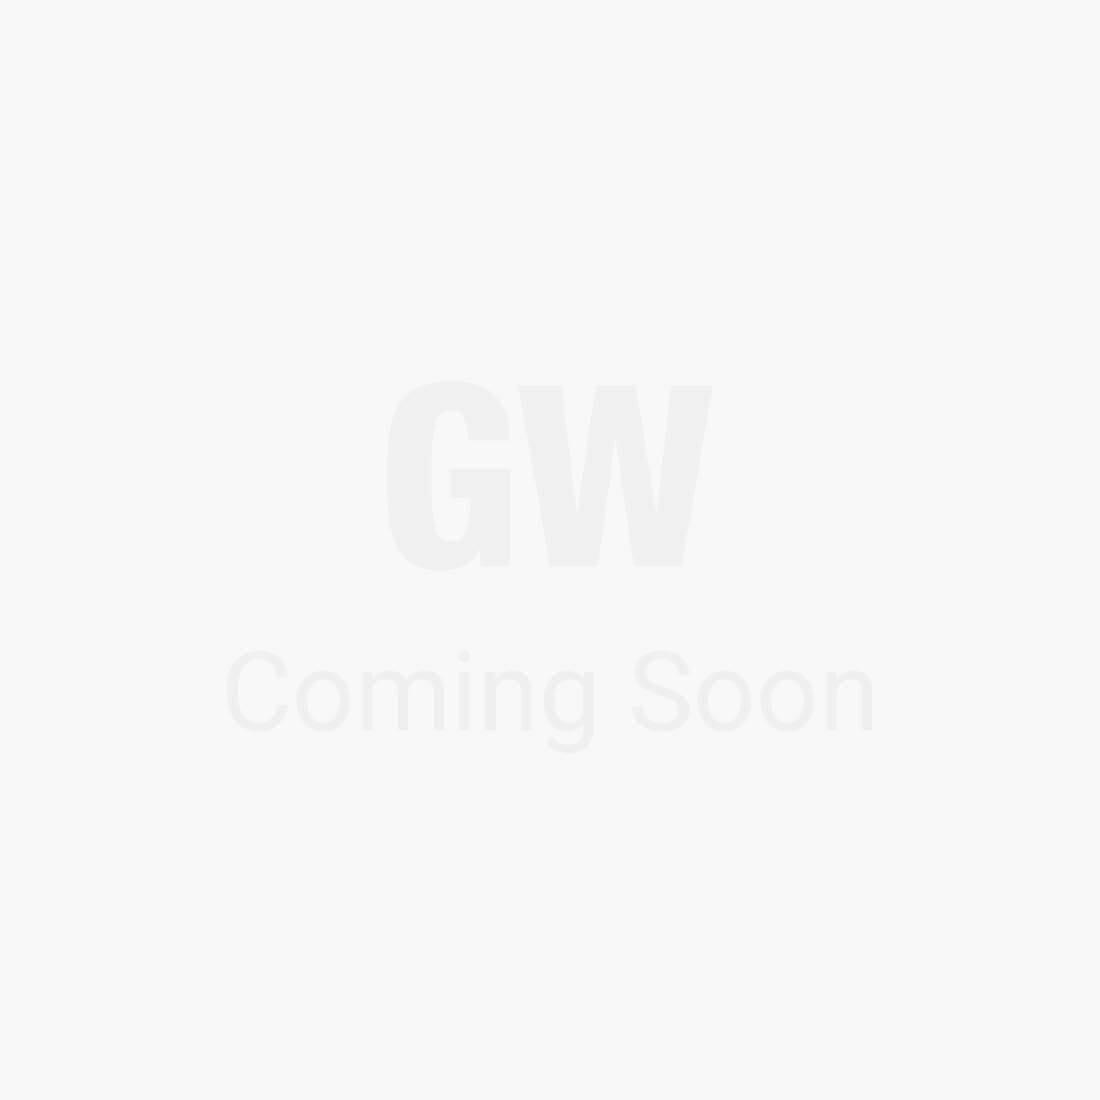 Bogart Square 1 Seater Sofa